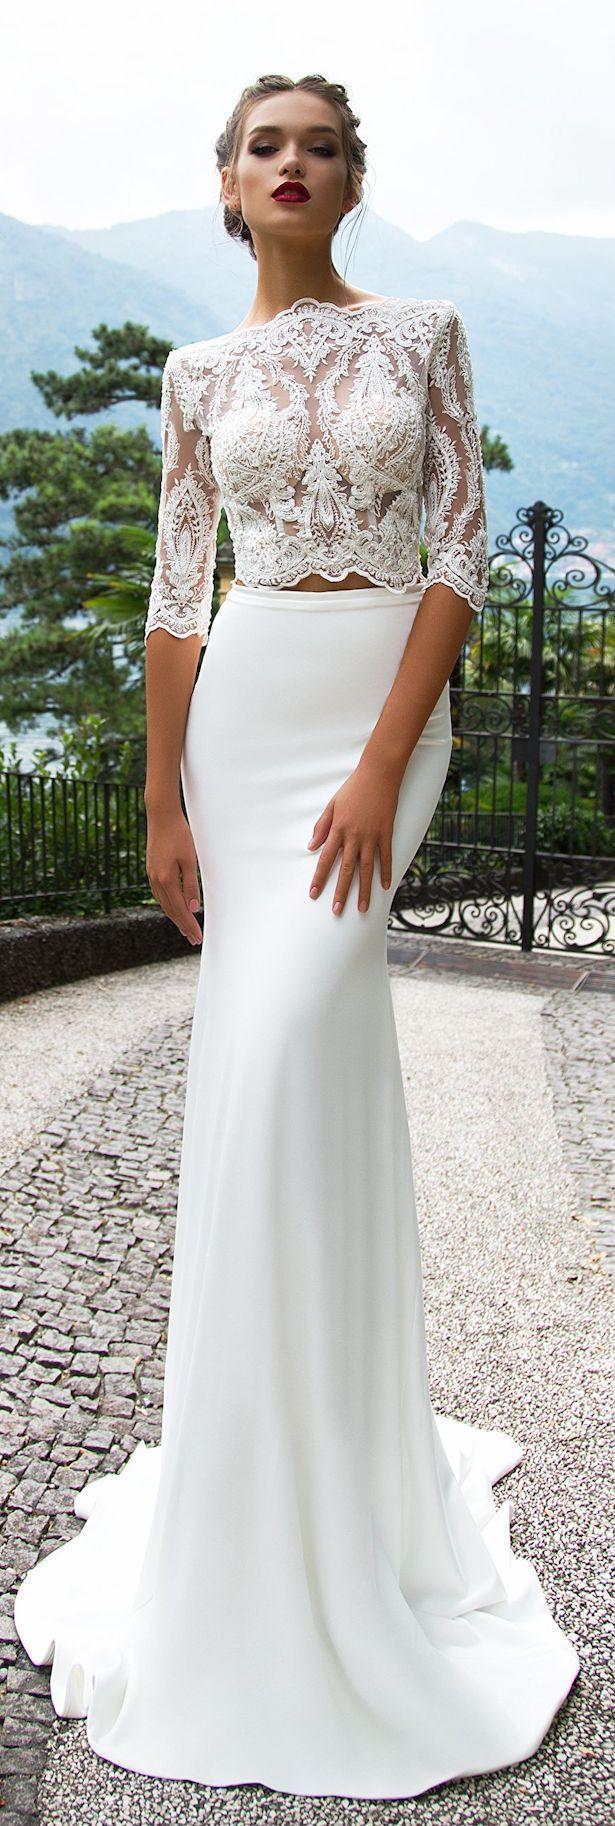 Wedding Dress by Milla Nova White Desire 2017 Bridal Collection Merill